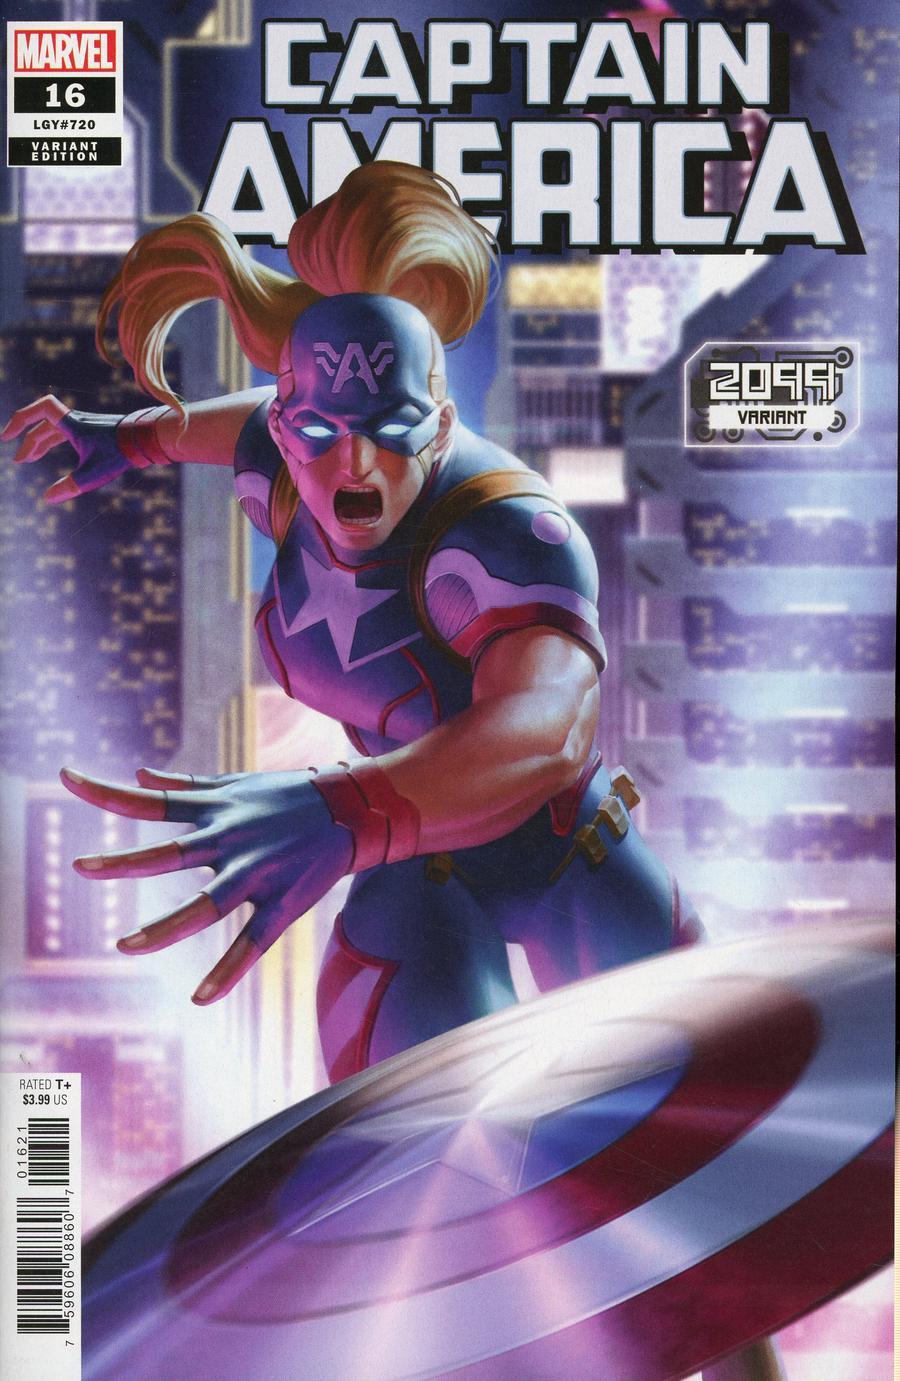 Captain America Vol 9 #16 Cover B Variant Junggeun Yoon 2099 Cover